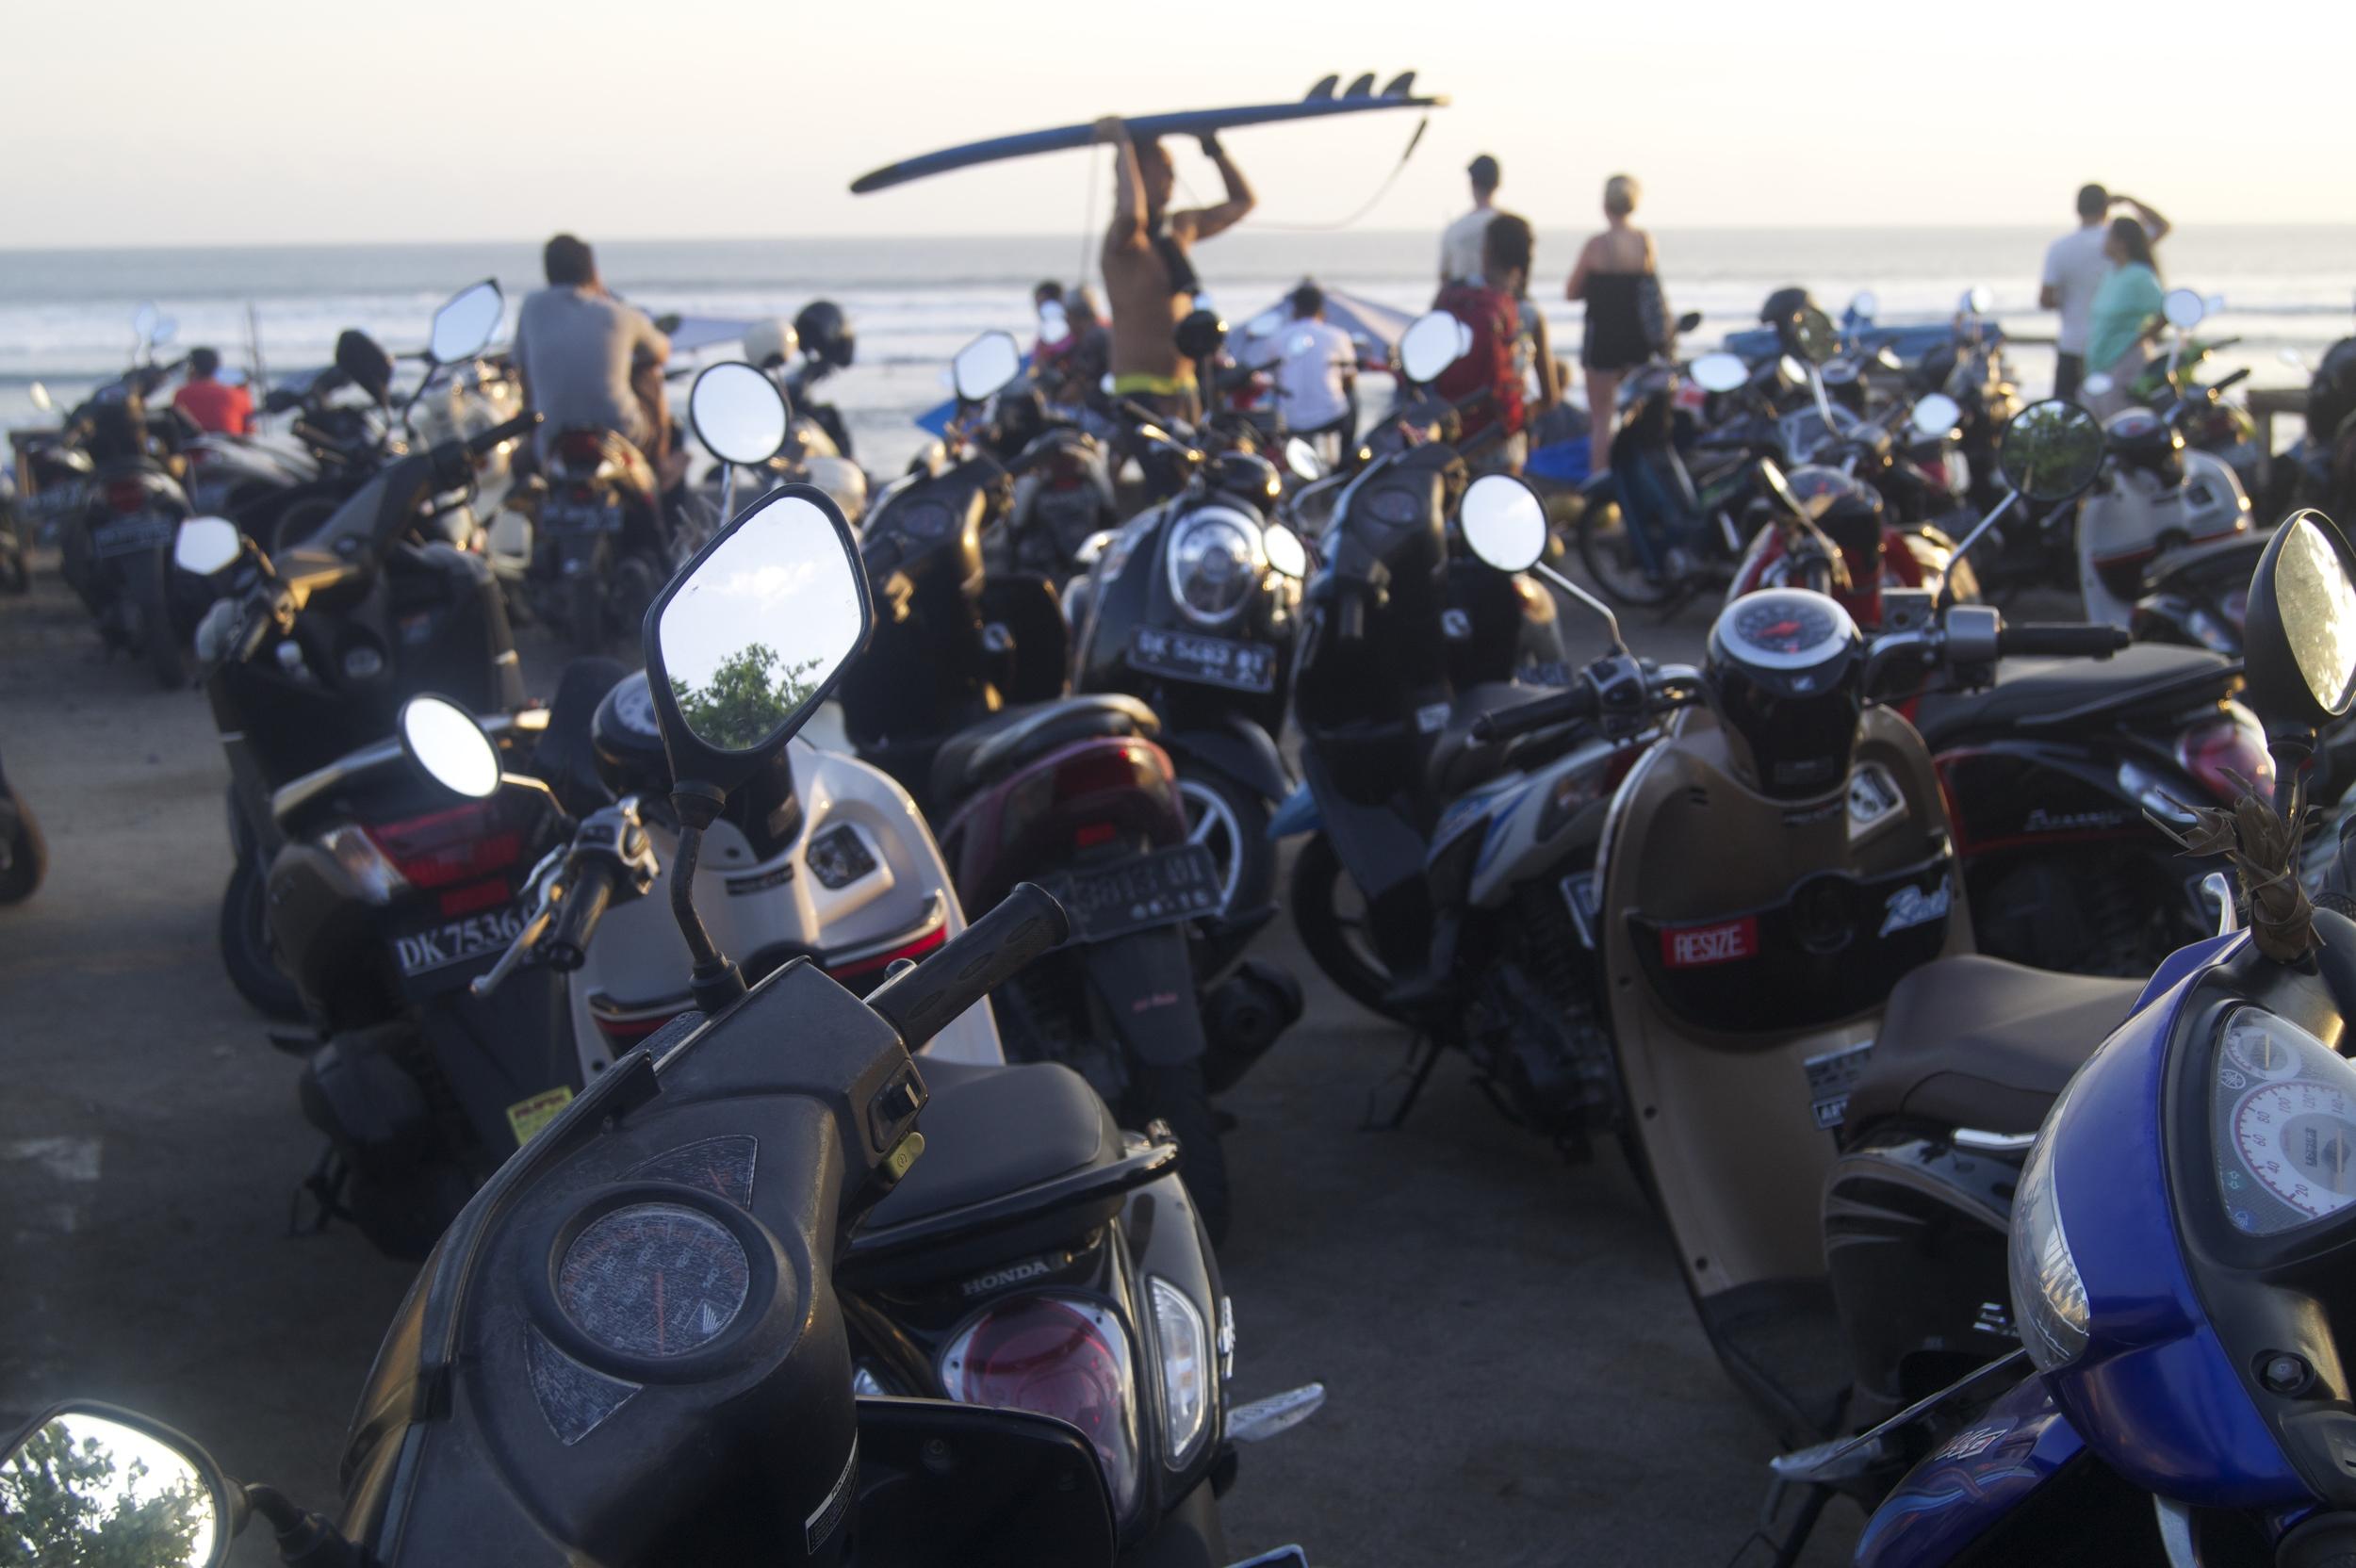 Canggu, Bali - Old Man's Beach - Motorbike Transportation and Sunset - illumelation.com